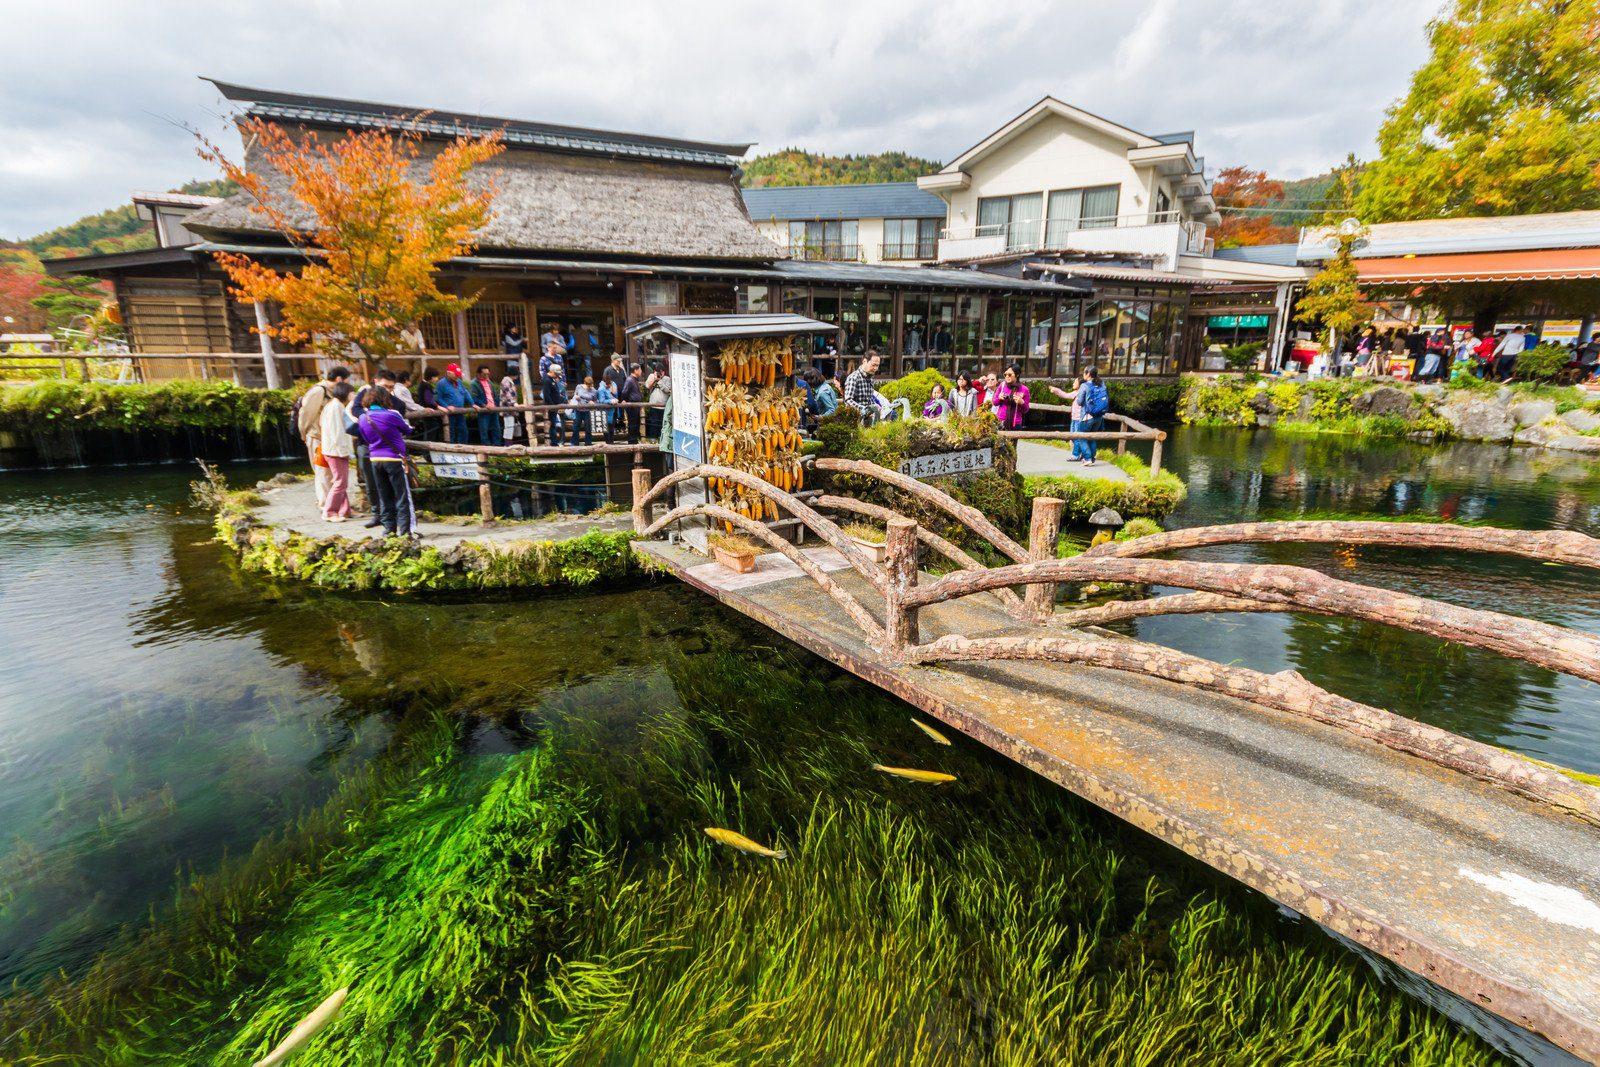 Oshino Hakkai Village Springs in the Five Lakes region near Mt Fuji